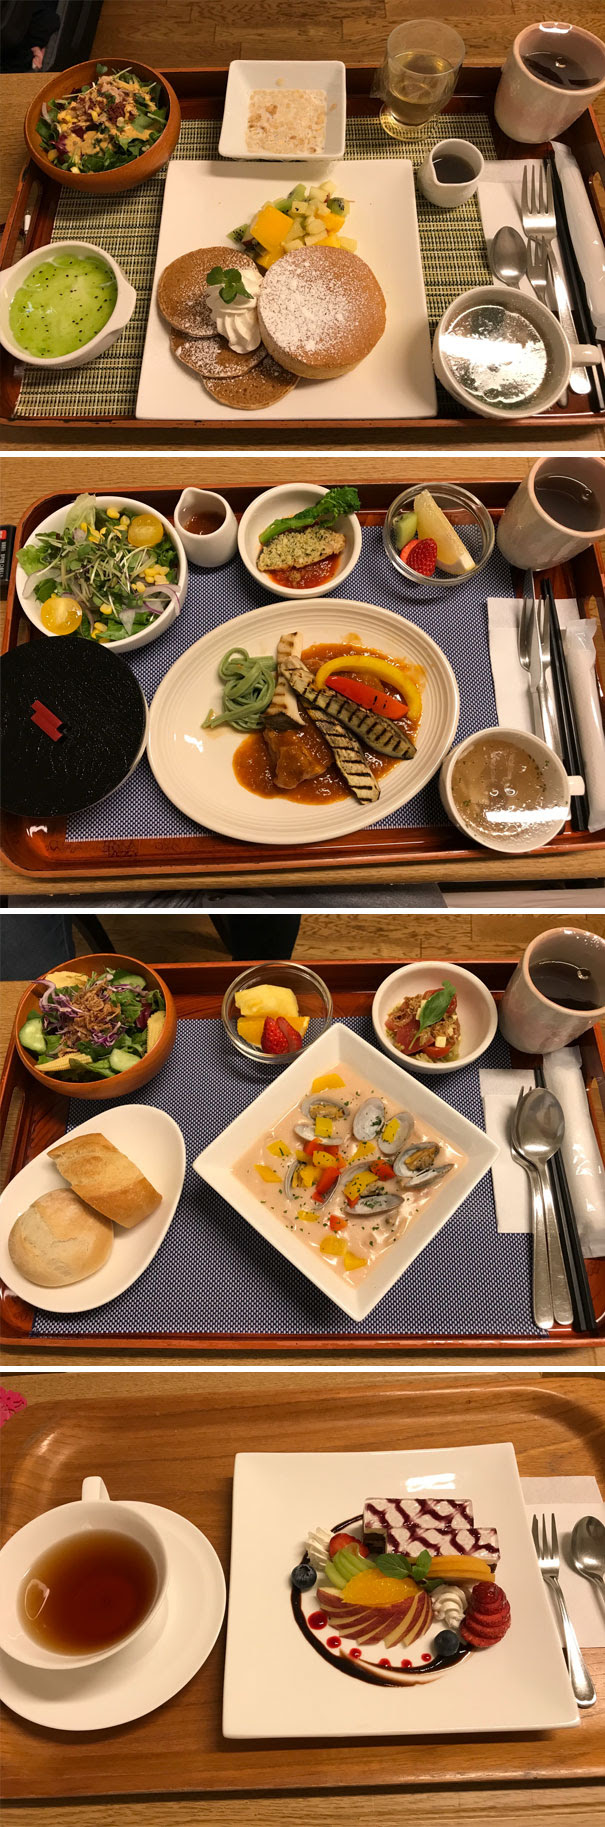 https://static.boredpanda.com/blog/wp-content/uploads/2018/05/reasons-why-japan-is-awesome-interesting-facts-23-5b0bb273326f1__605.jpg